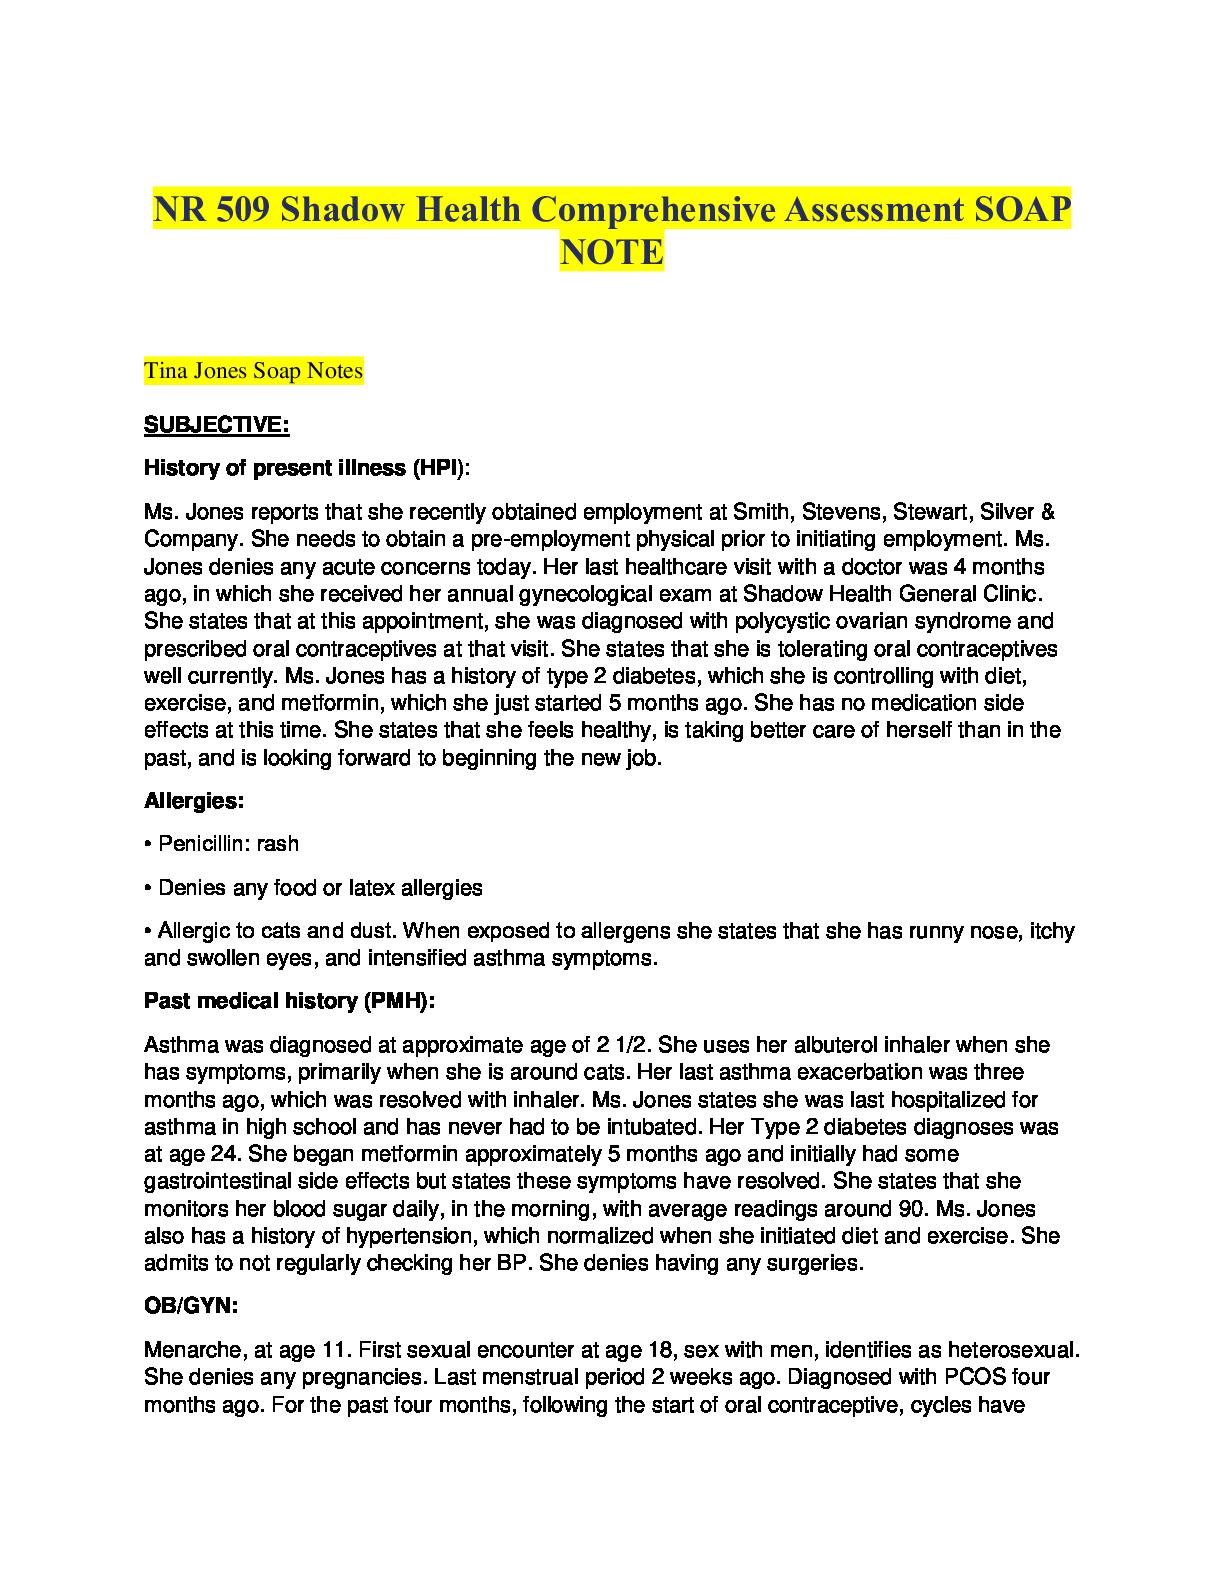 Nr 509 Shadow Health Comprehensive Assessment Soap Note In 2021 Assessment Soap Note Soap Notes